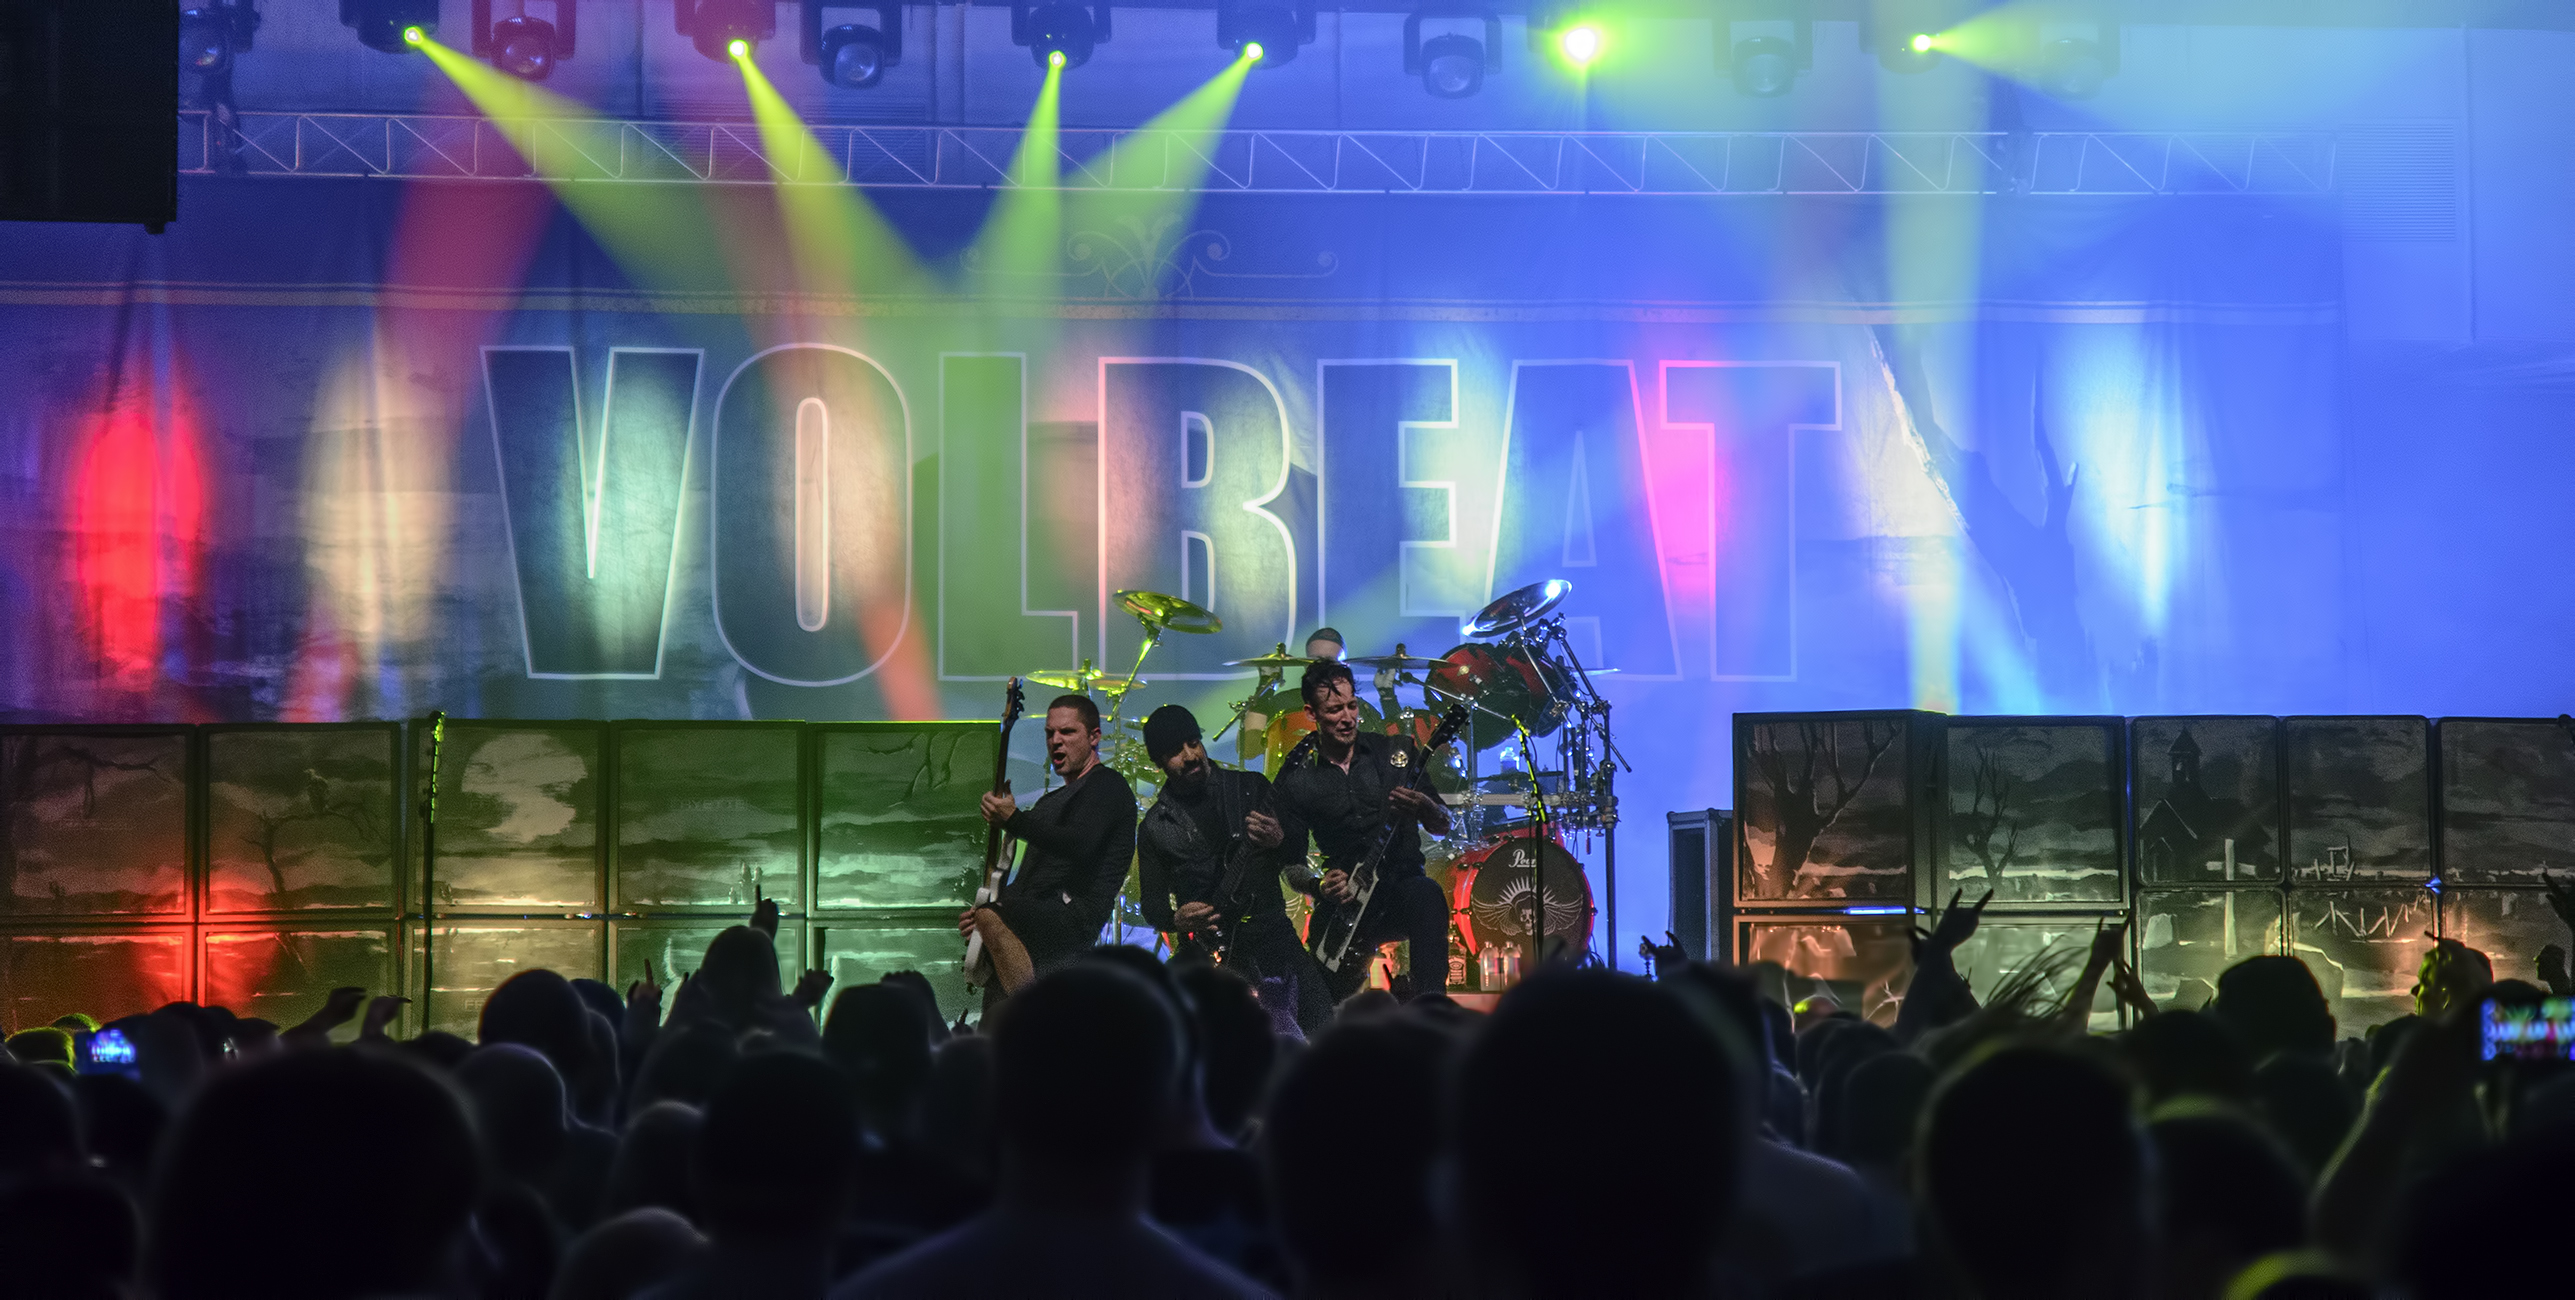 volbeat medford armory